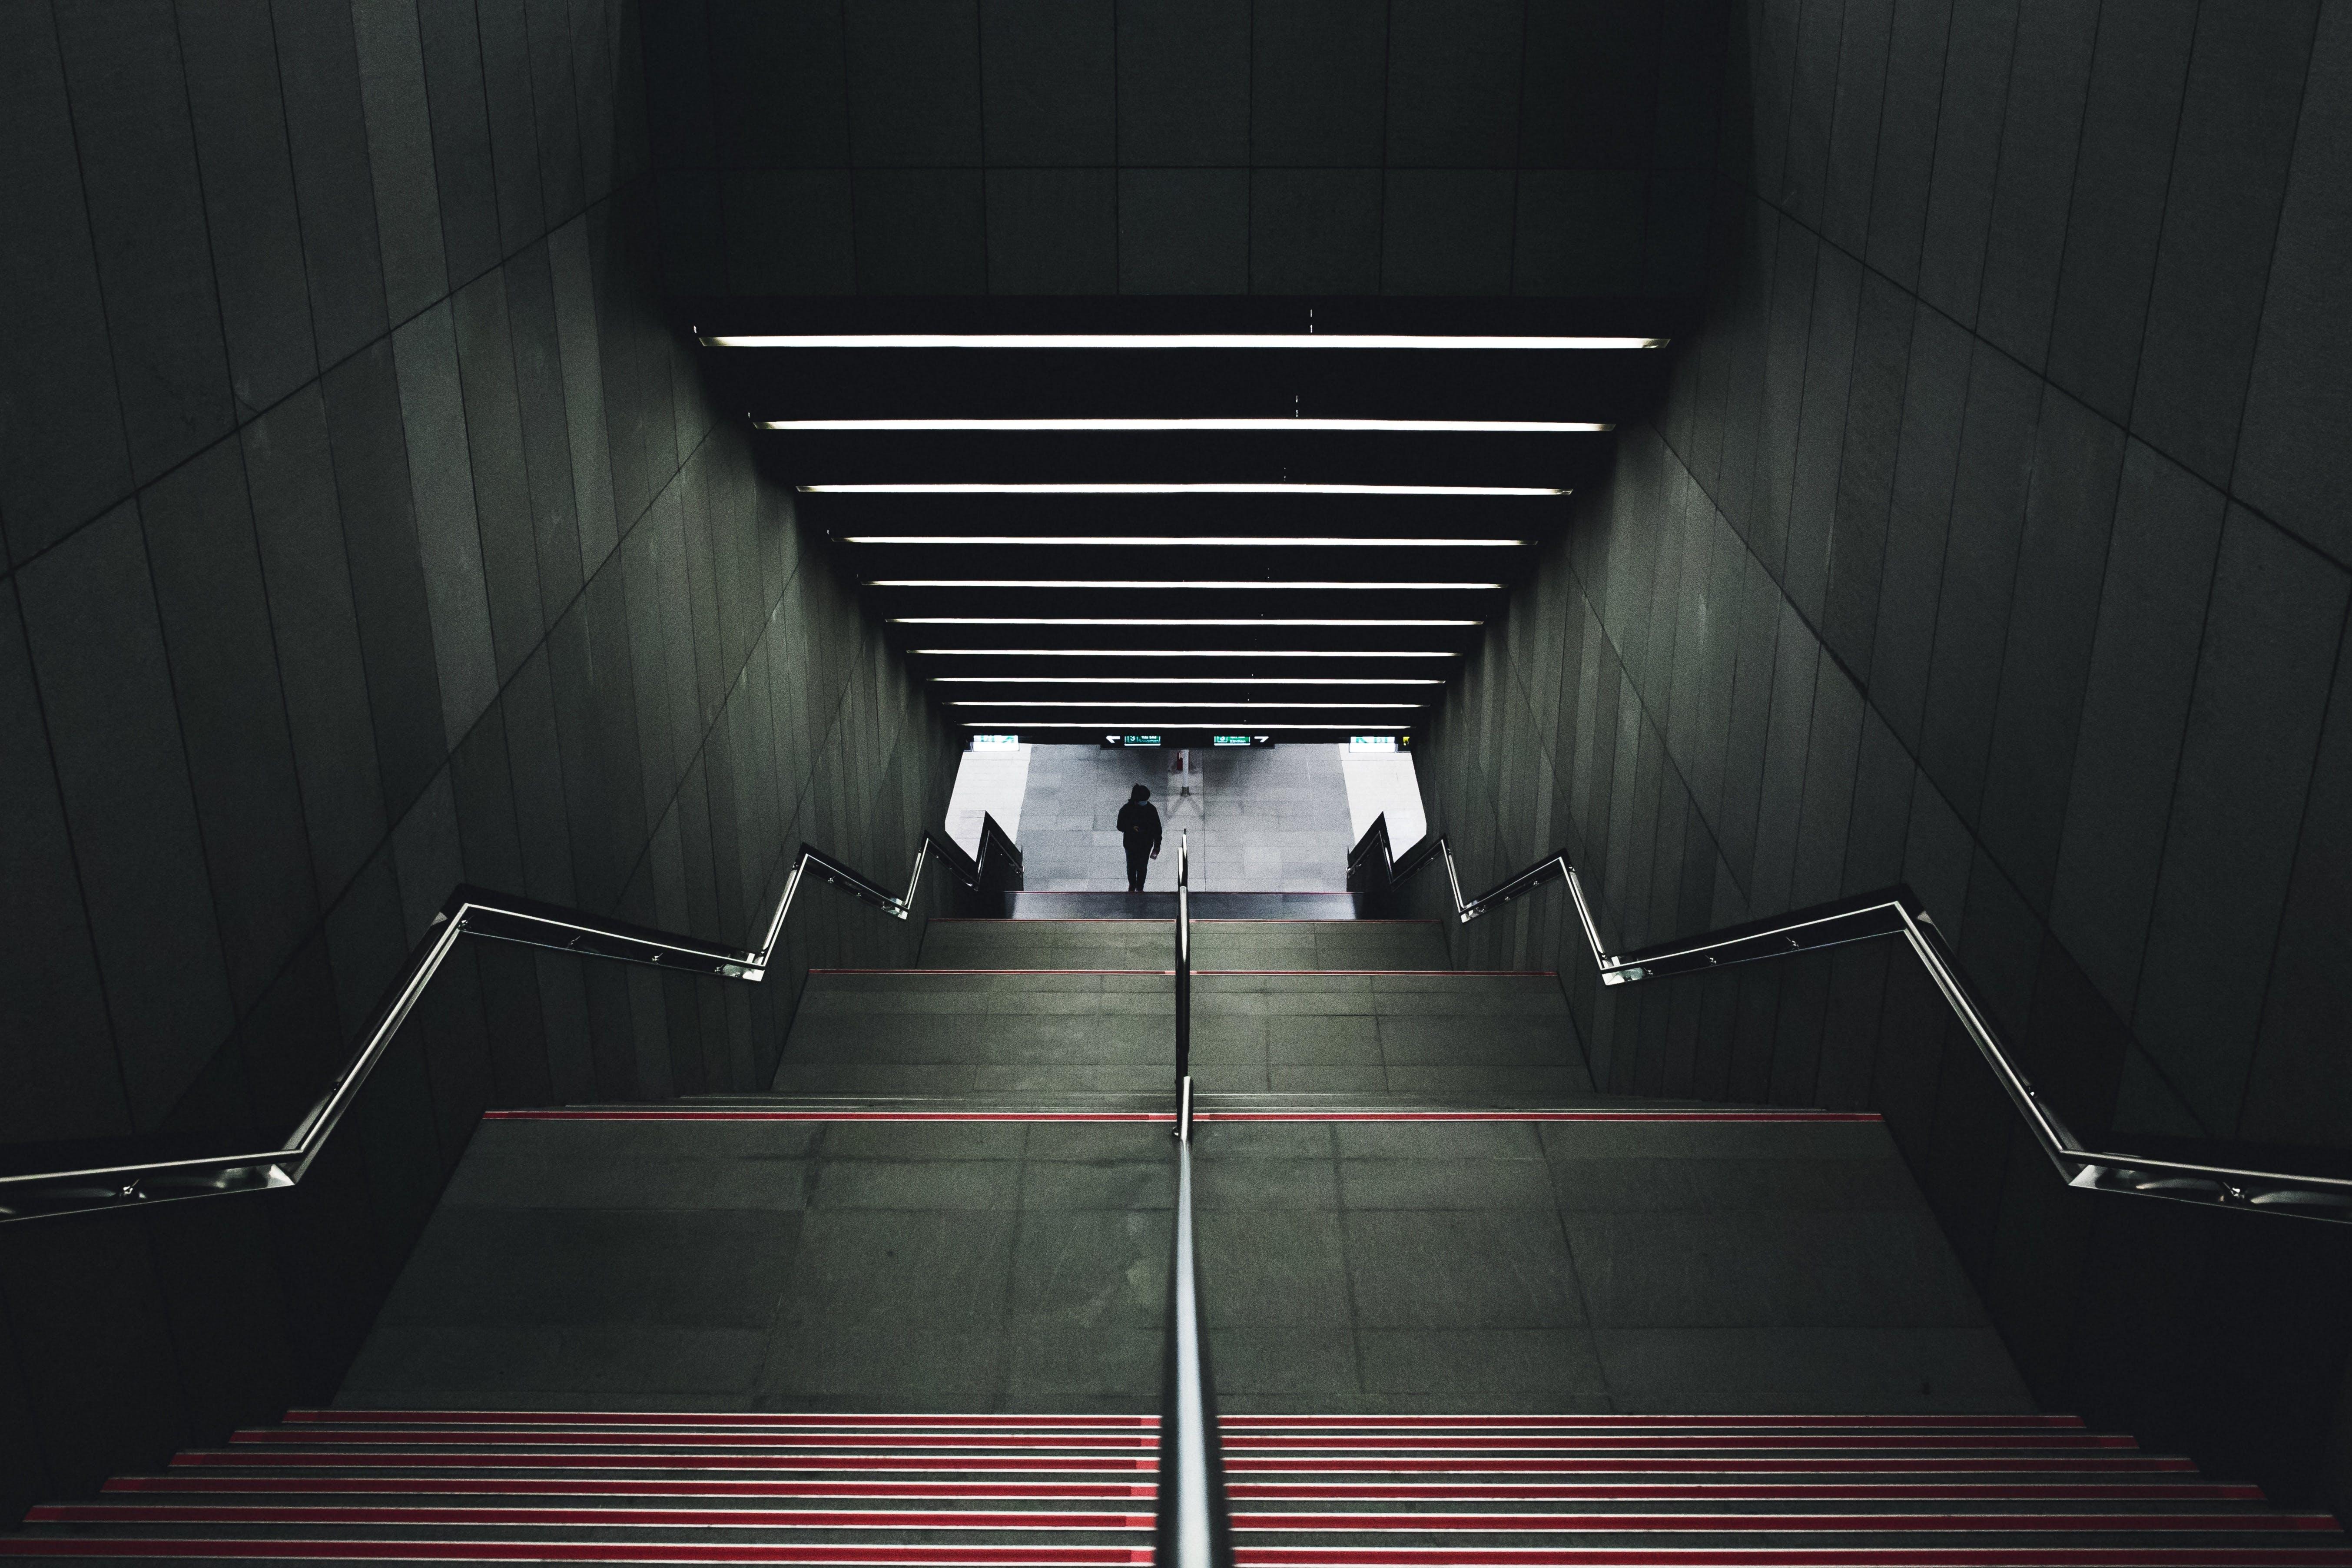 Free stock photo of stairs, lights, public transportation, underground